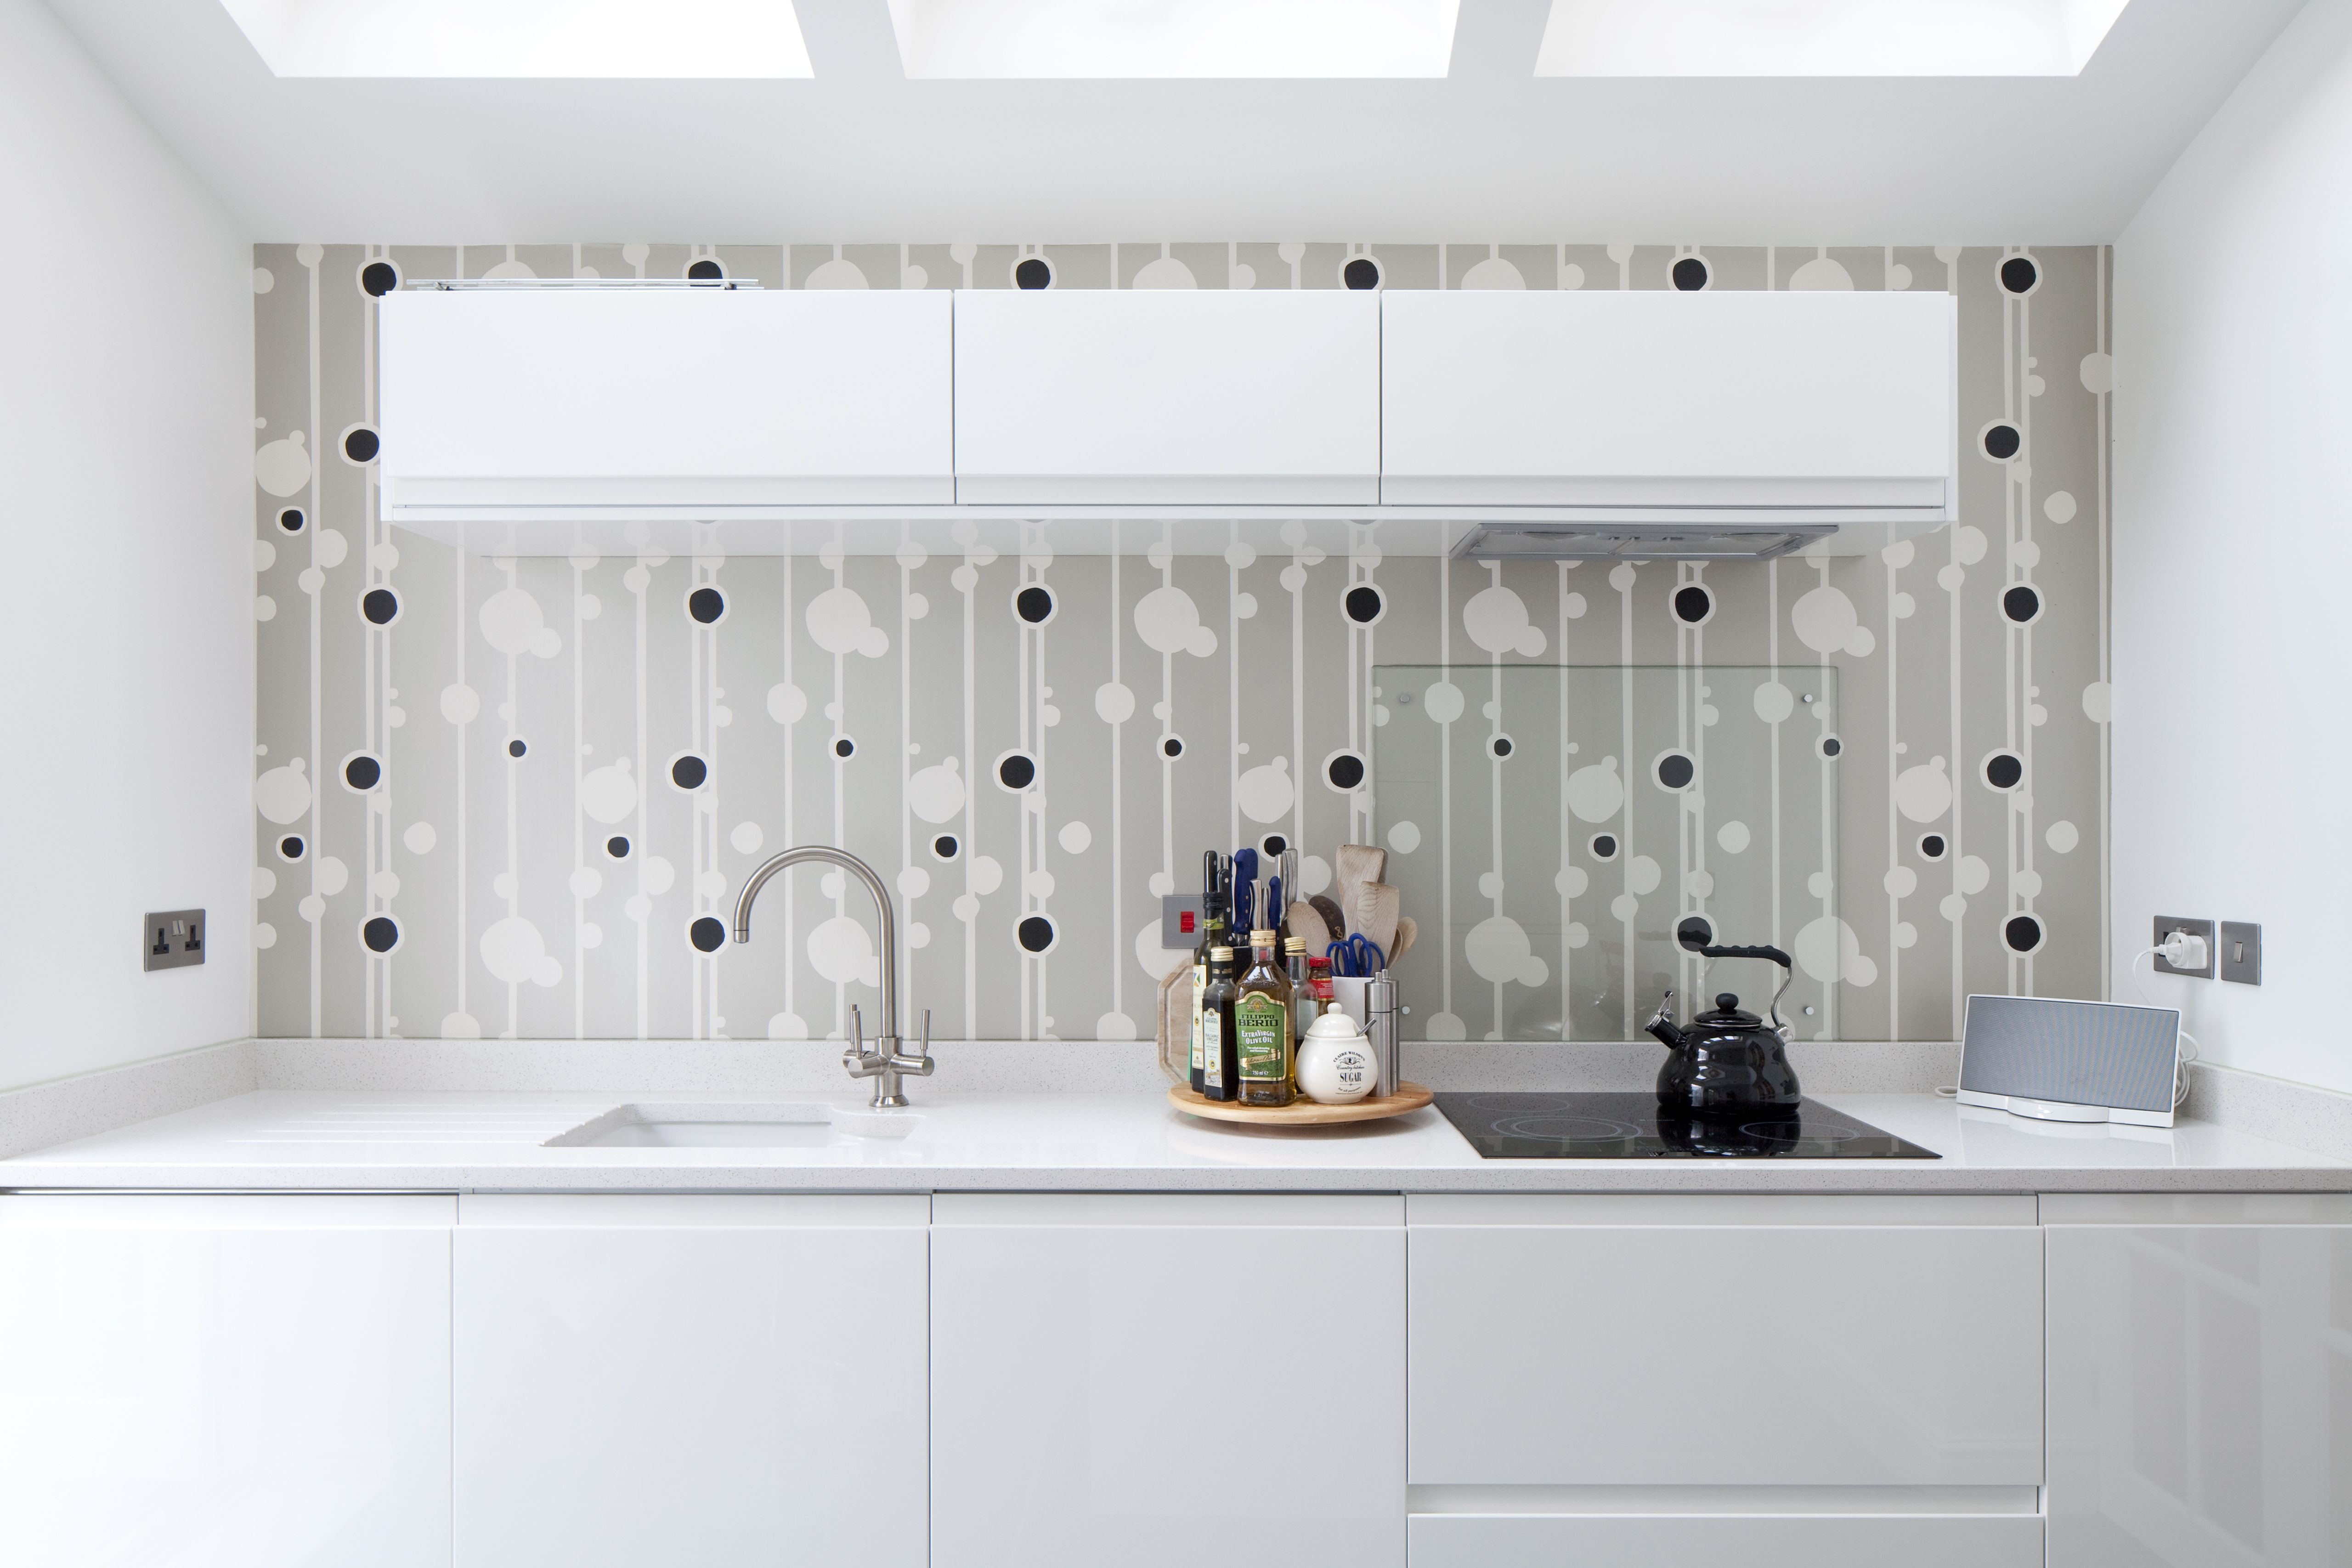 Modern Kitchen Wallpaper Designs 5120x3413 Wallpaper Teahub Io